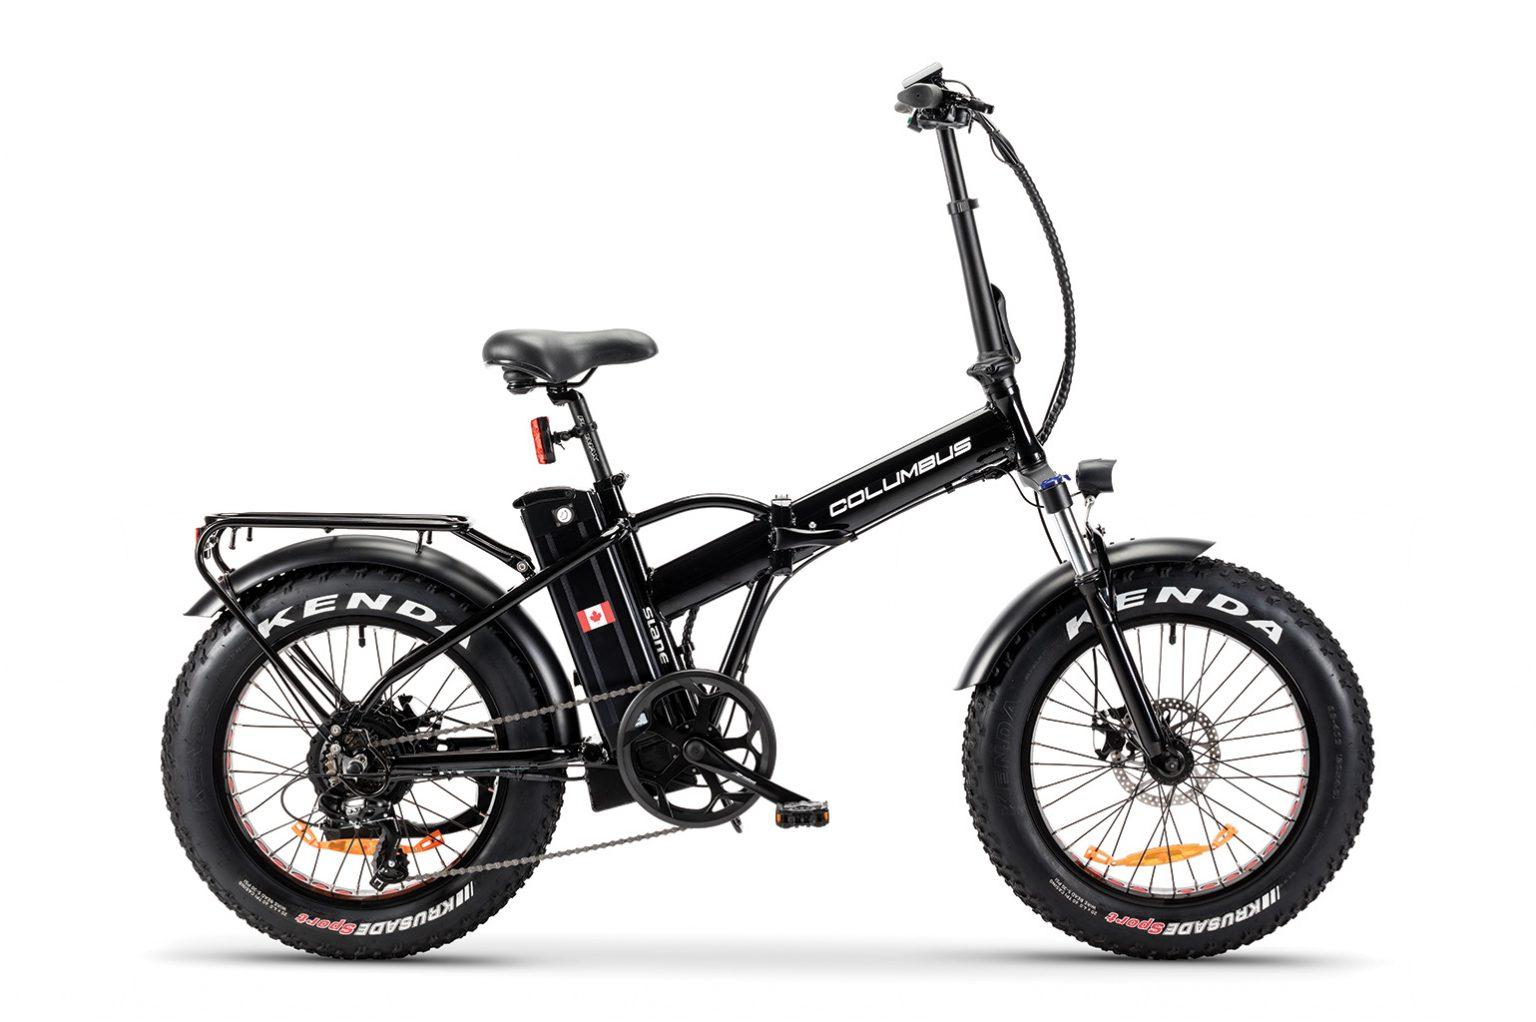 The Slane Columbus E-Bike